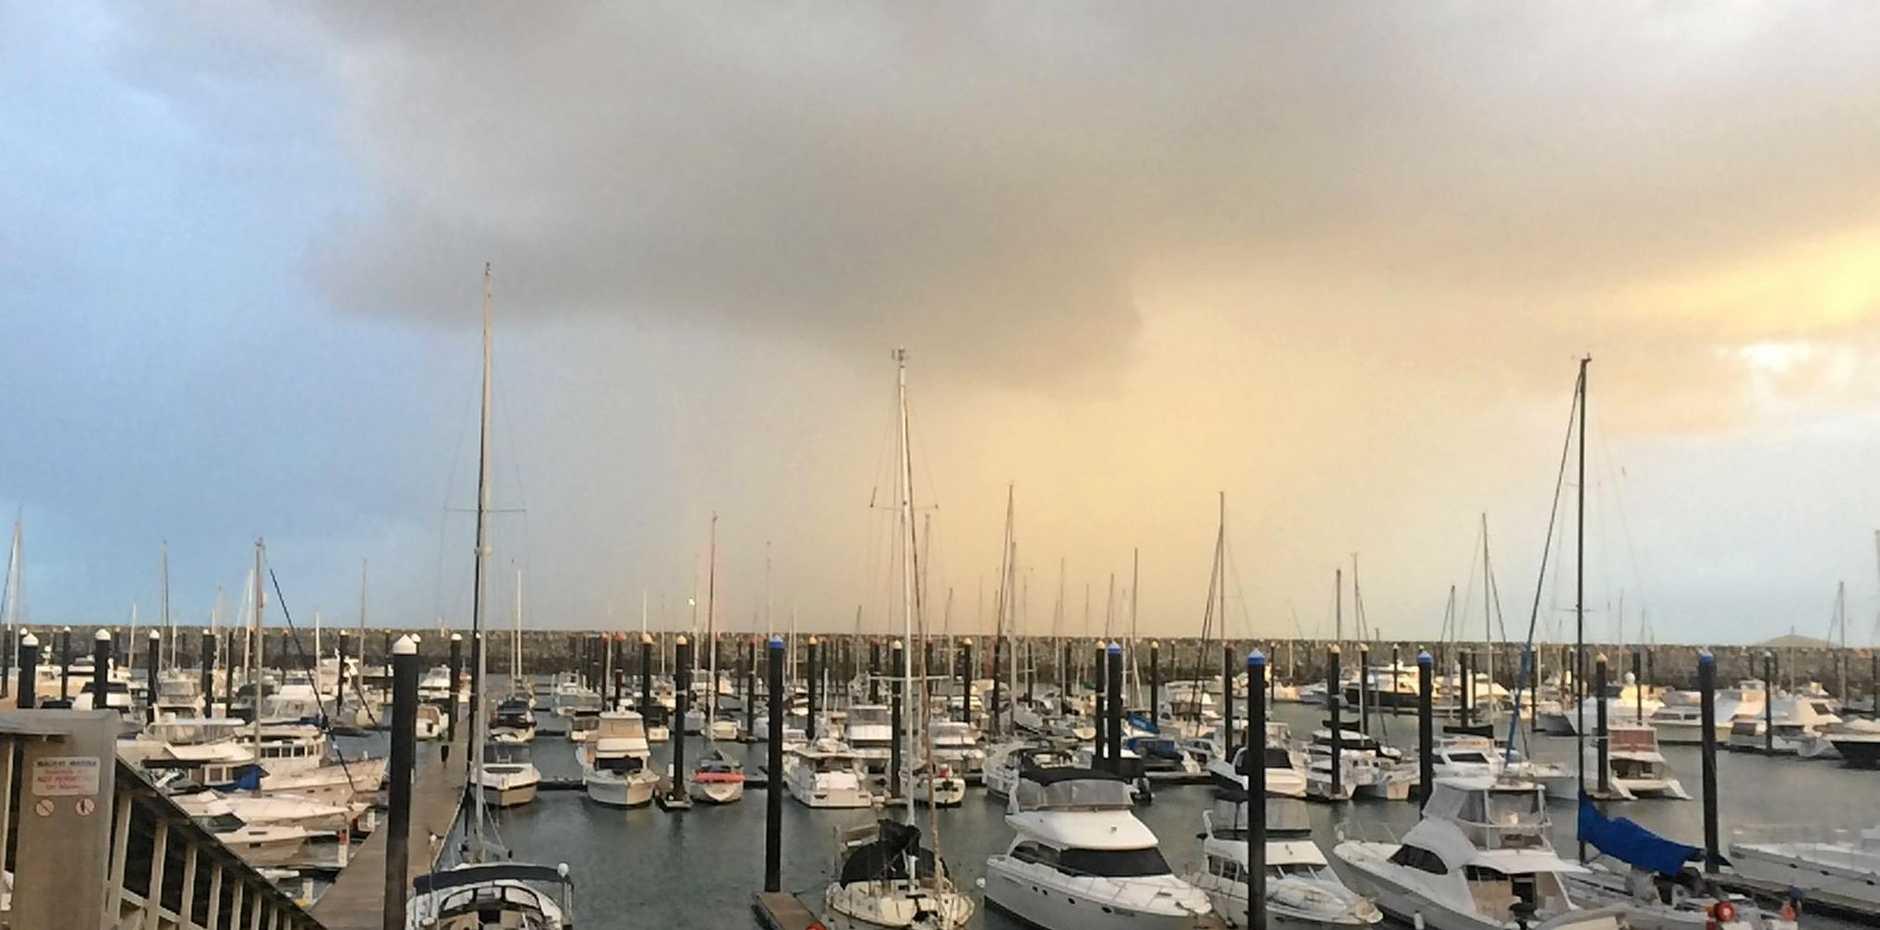 Mackay turned into the windy city last night.